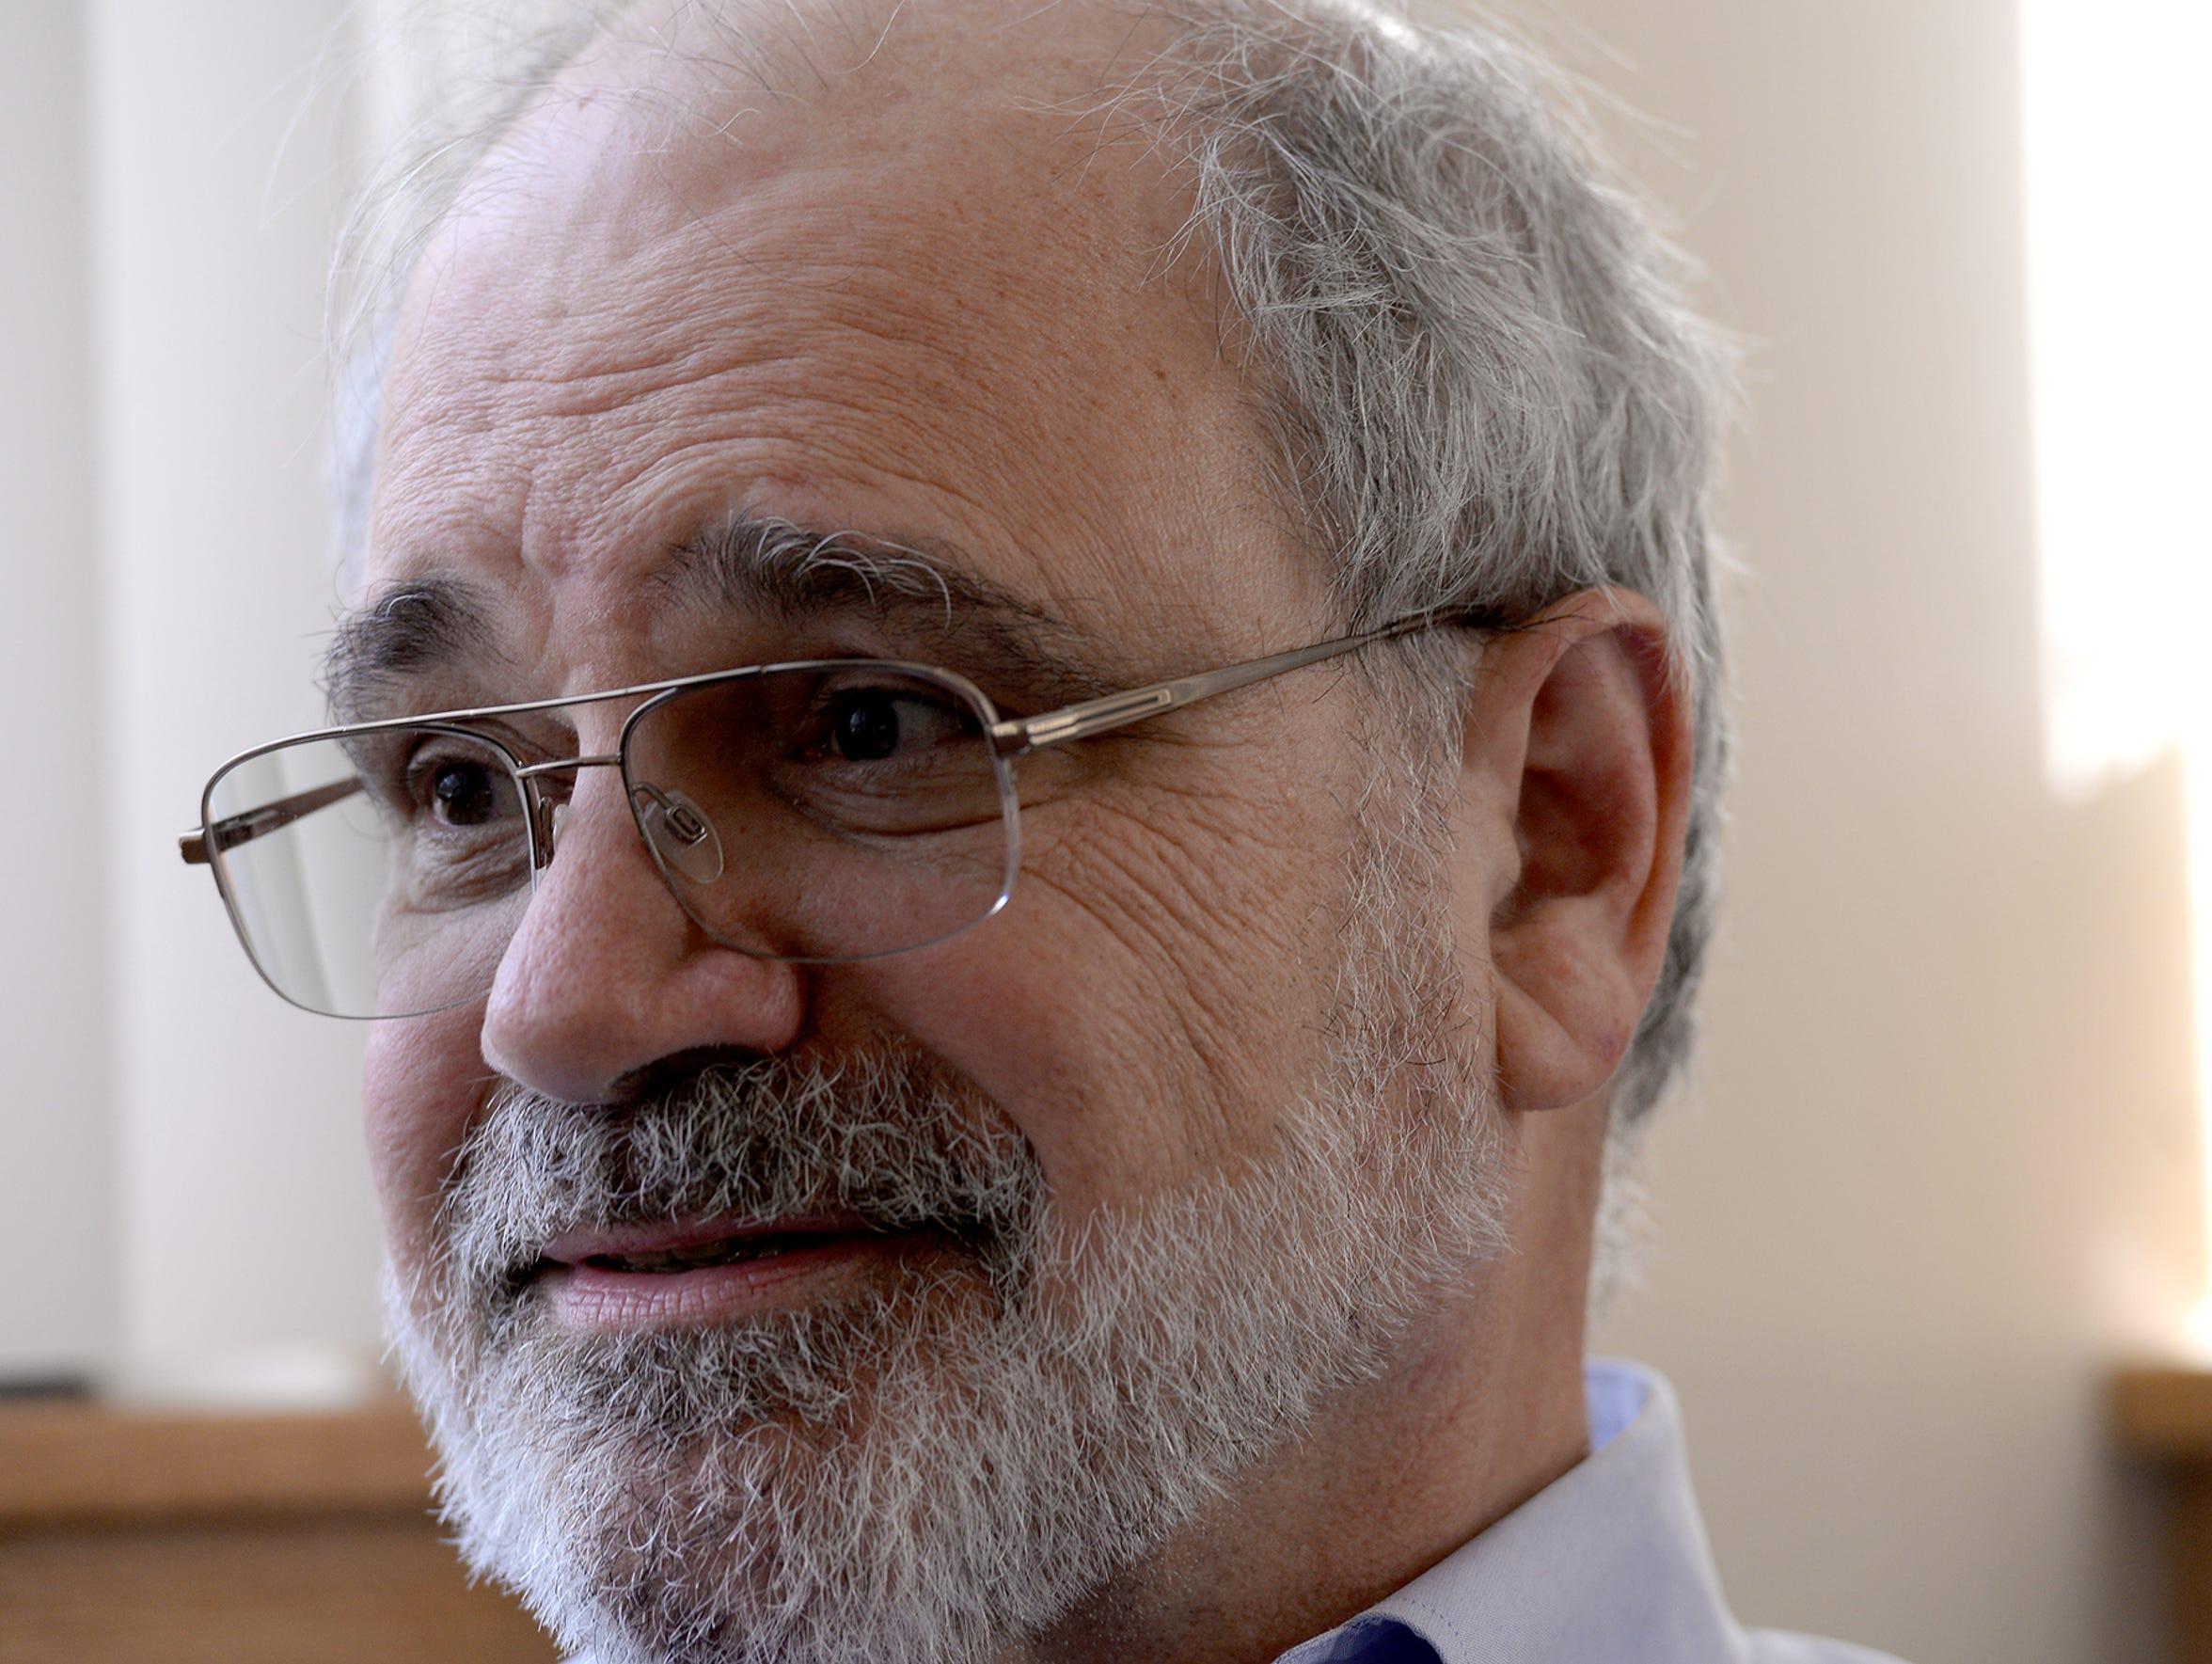 Dr. Ralph Harvey talks about writing prescriptions